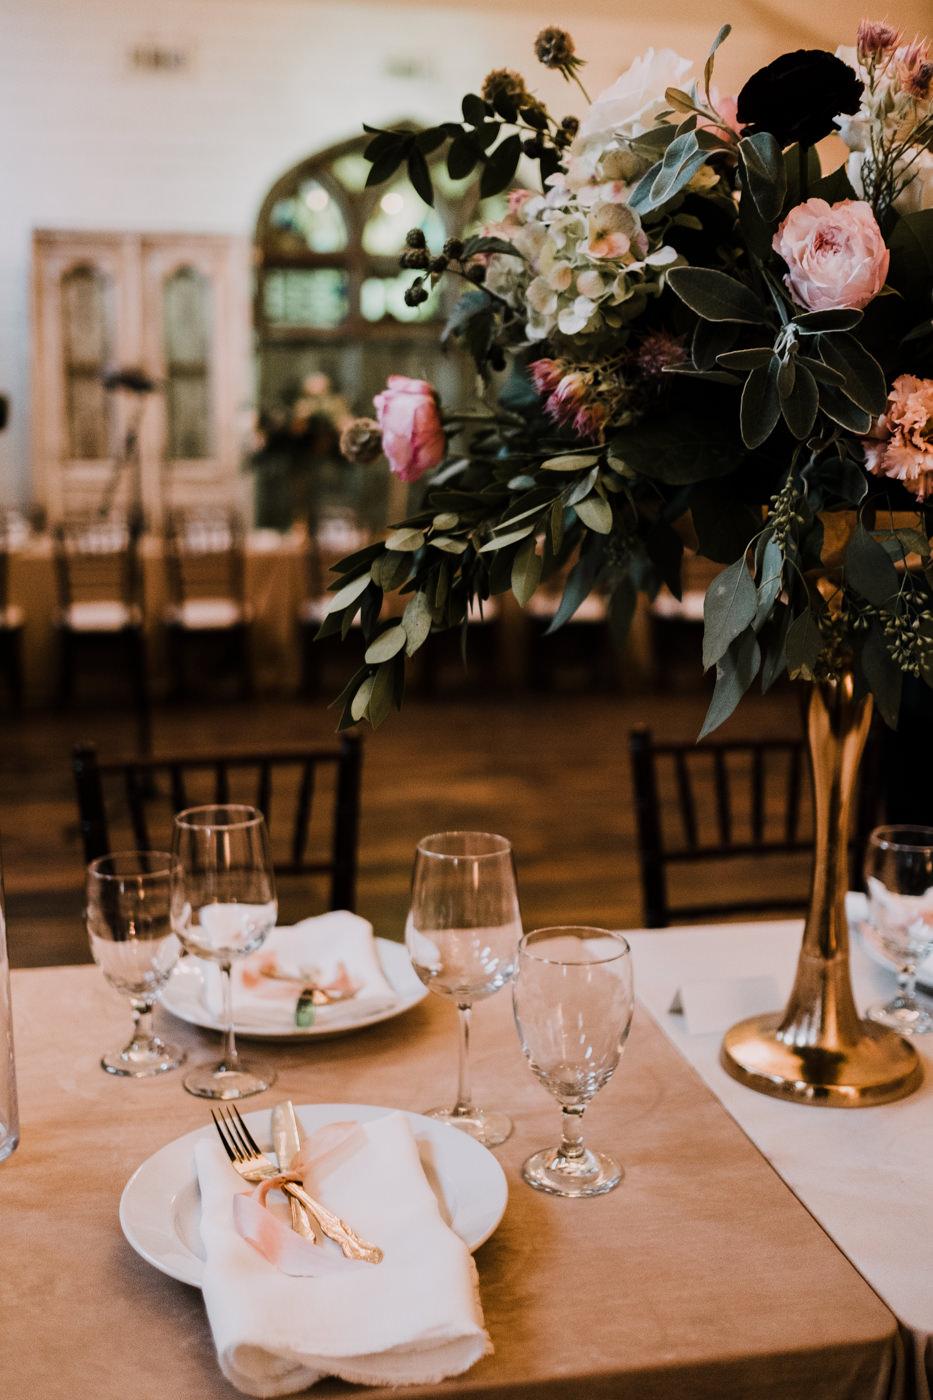 ravington.wedding.northwestarkansas.mileswittboyer-34.jpg